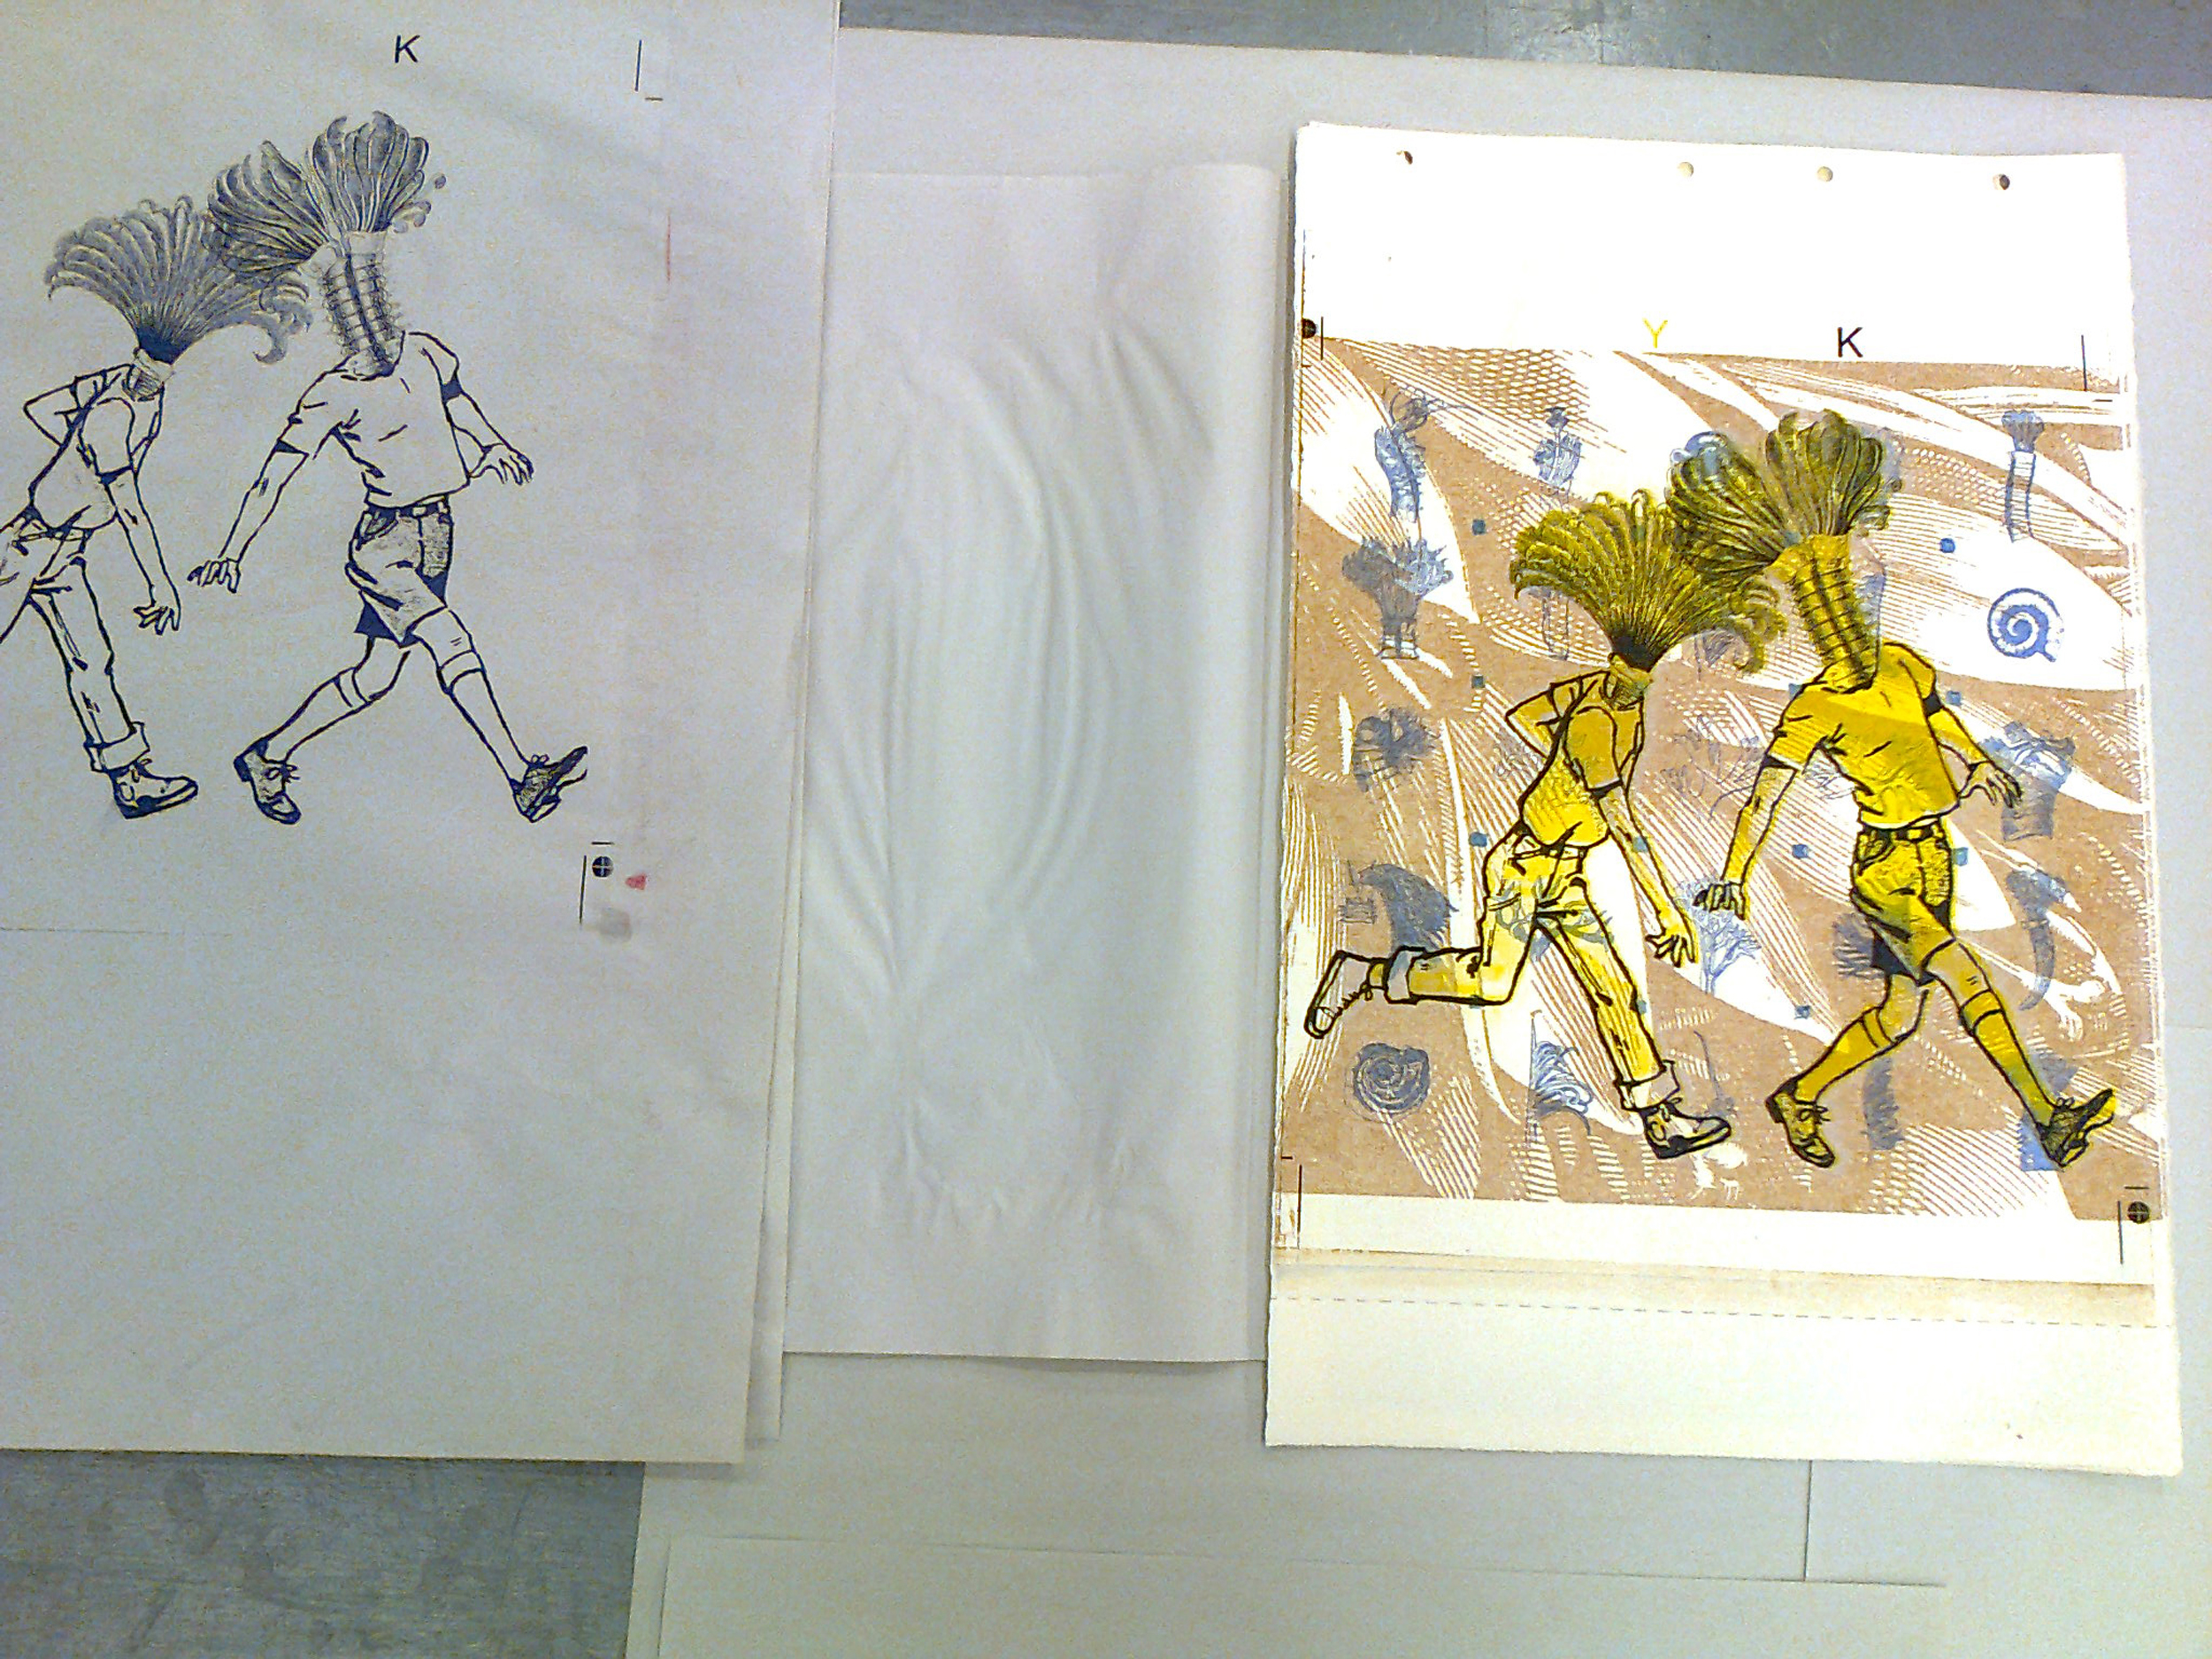 testimonial-i-iii-iii-progress-documentation-cellphone-sketchbook-059.jpg